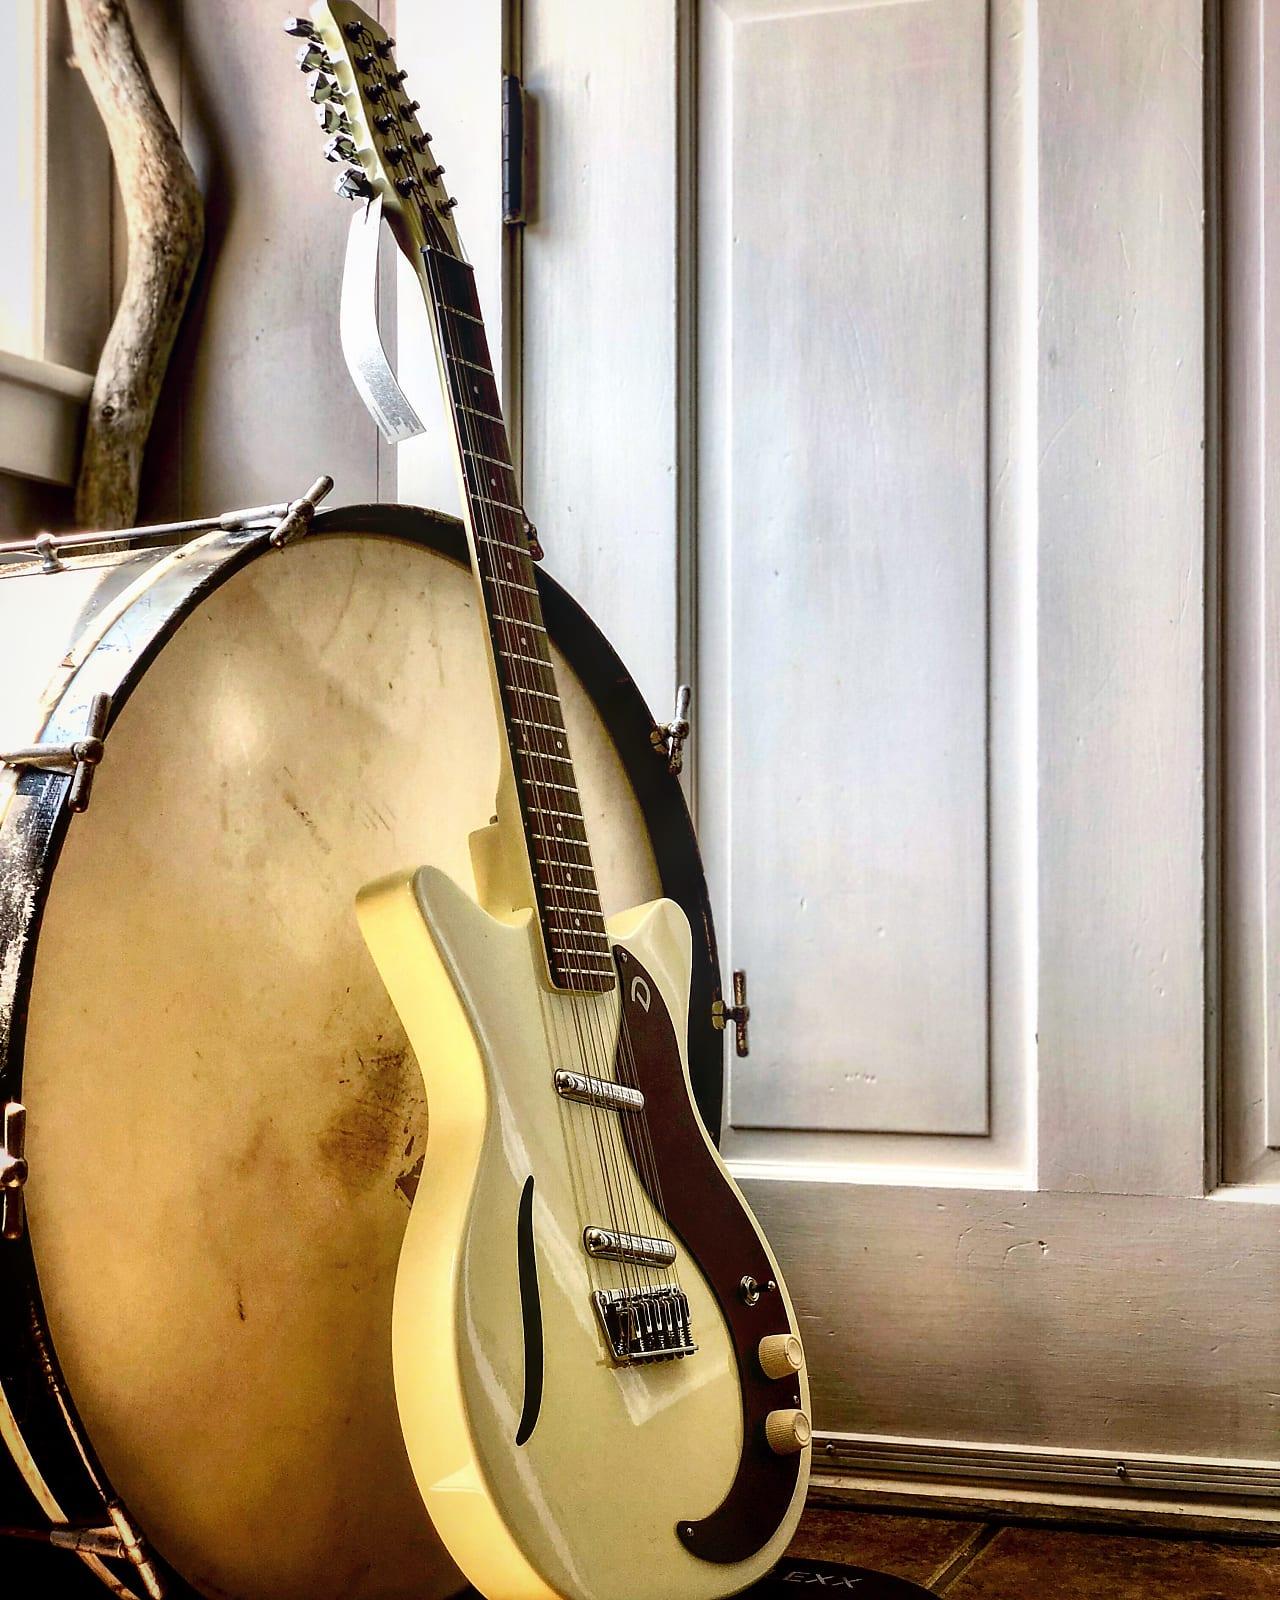 Danelectro 59 Vintage 12 String Guitar - Vintage White